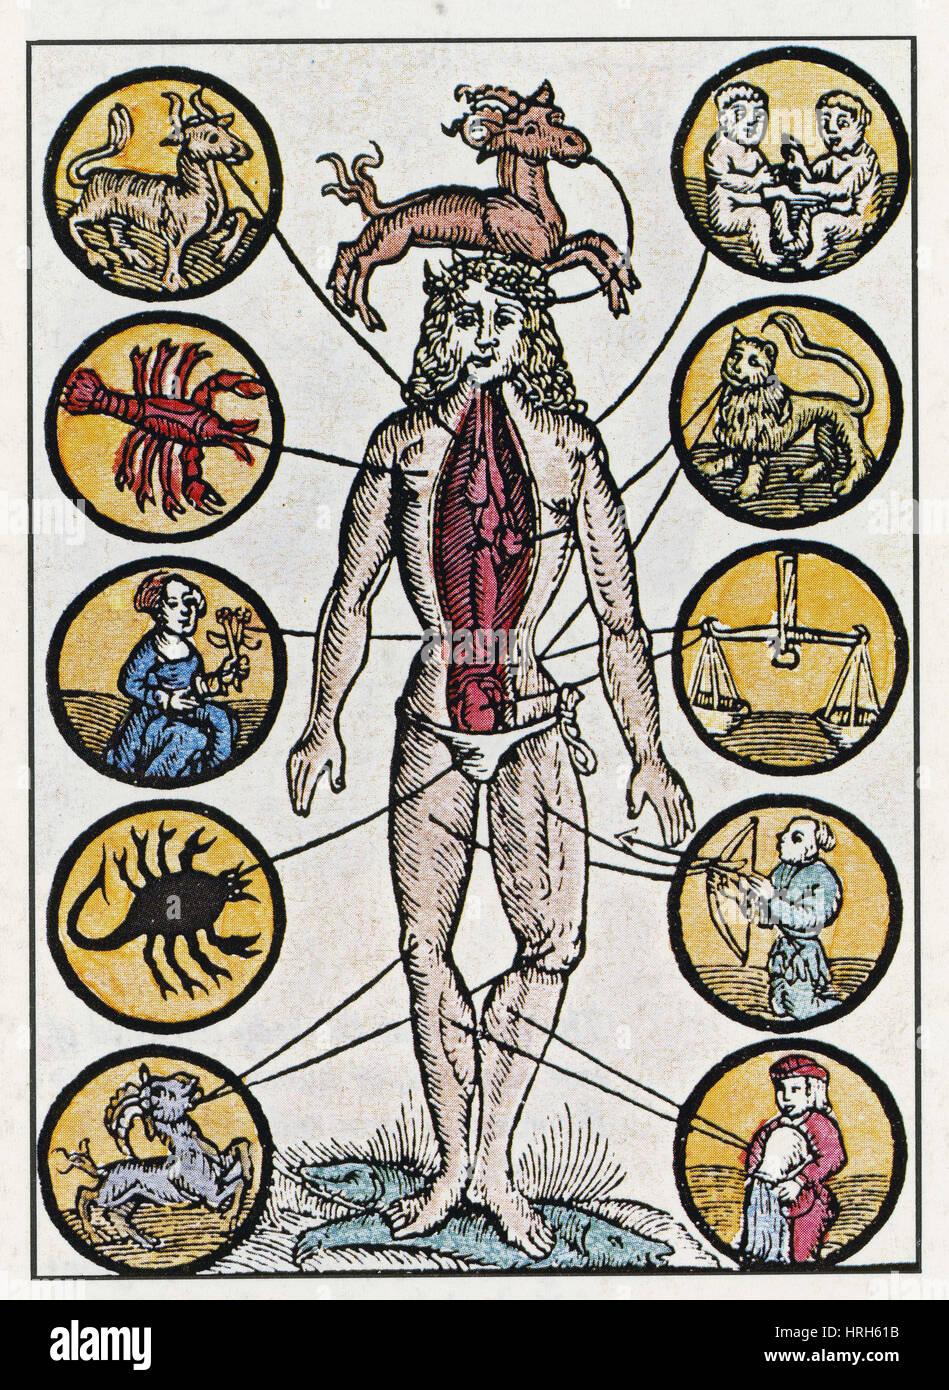 Medical Zodiac Man, 16th Century Stock Photo: 134987591 - Alamy